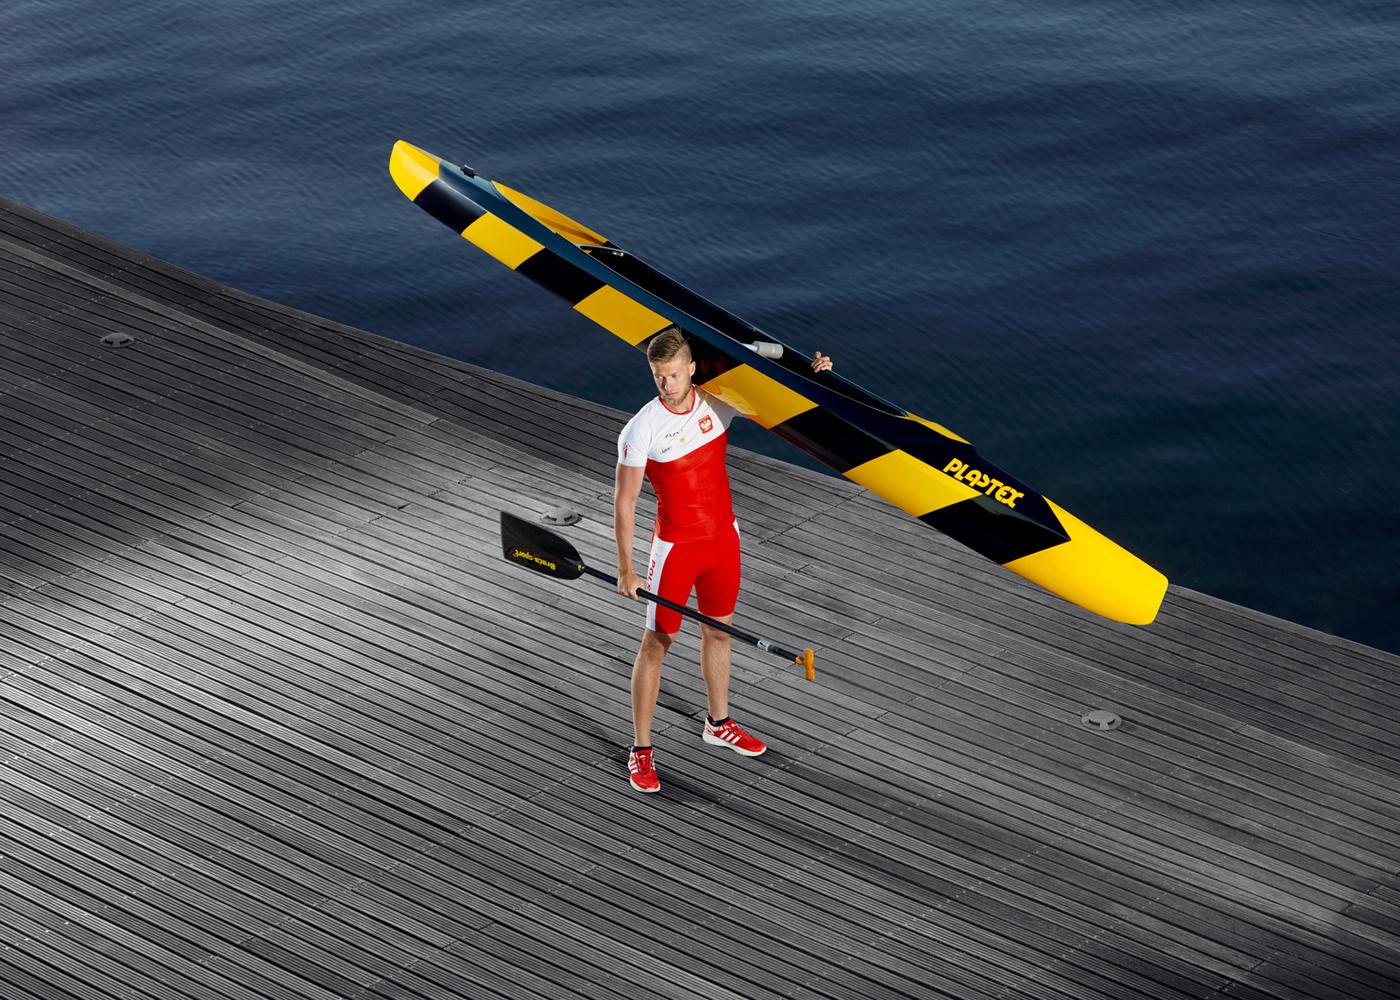 Canoe_01 by Sebastian Malinowski